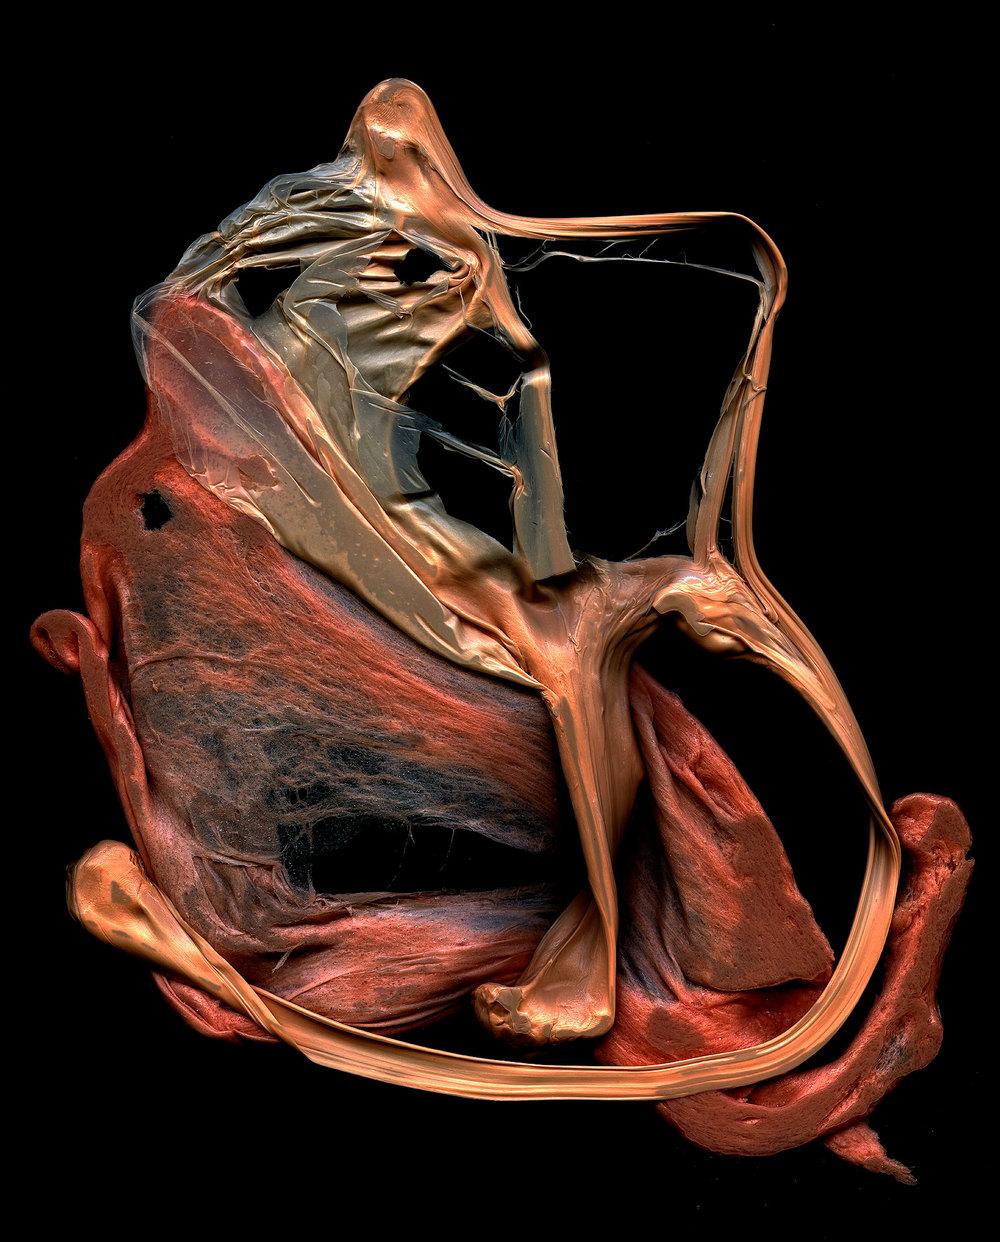 content_plain-magazine-michael-massaia-flamenco-dancer